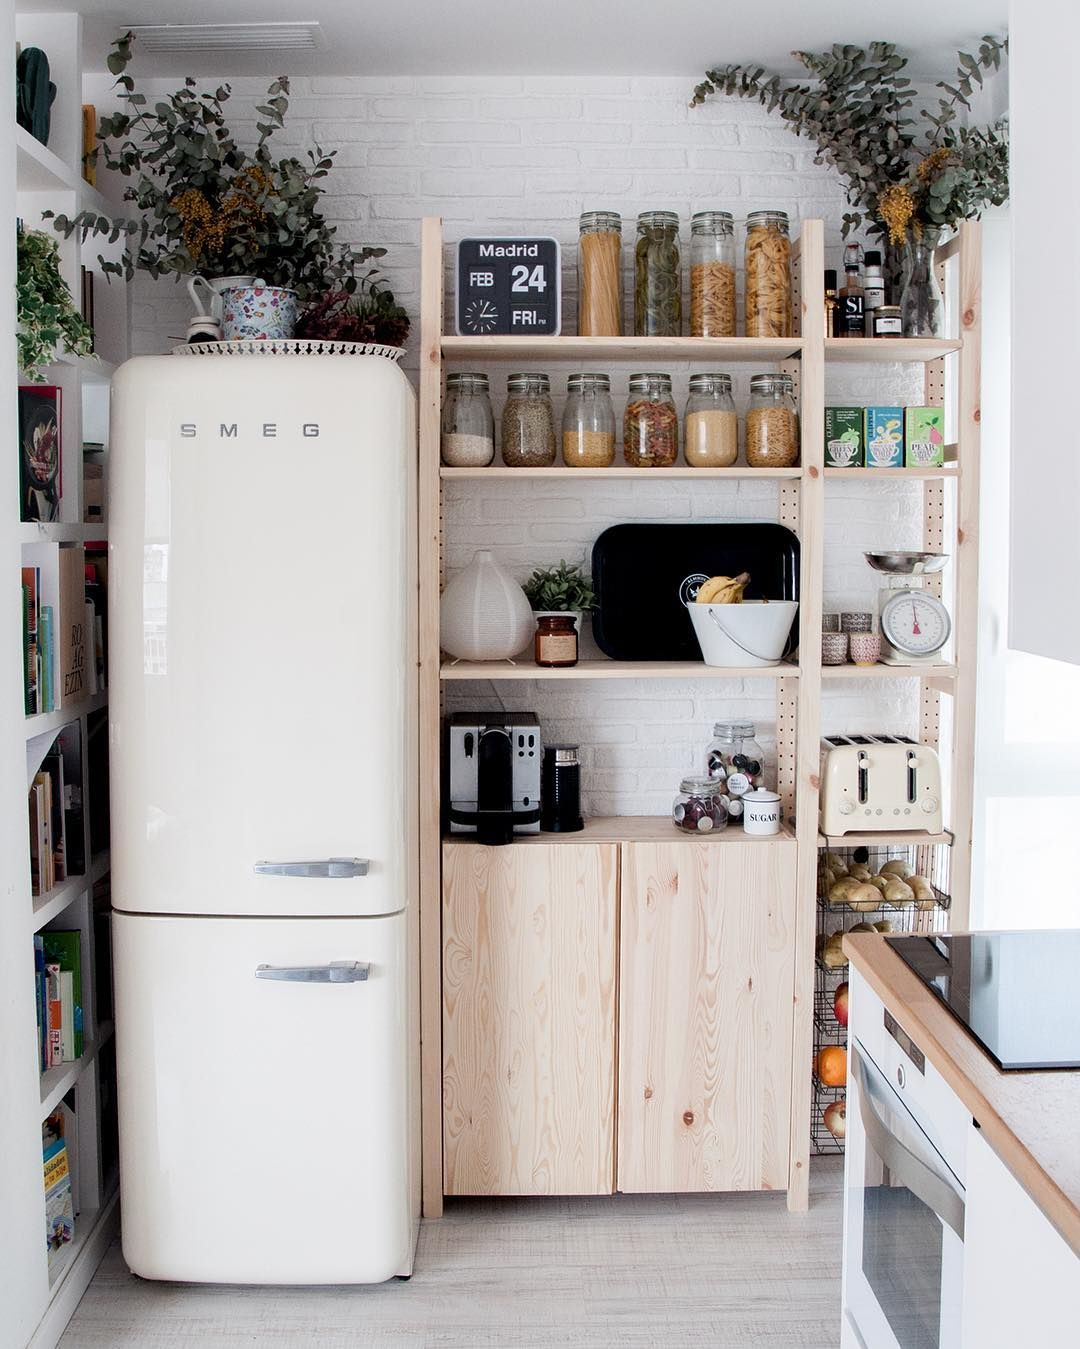 Retro kühlschrank yua pinterest interiors kitchens and apartments